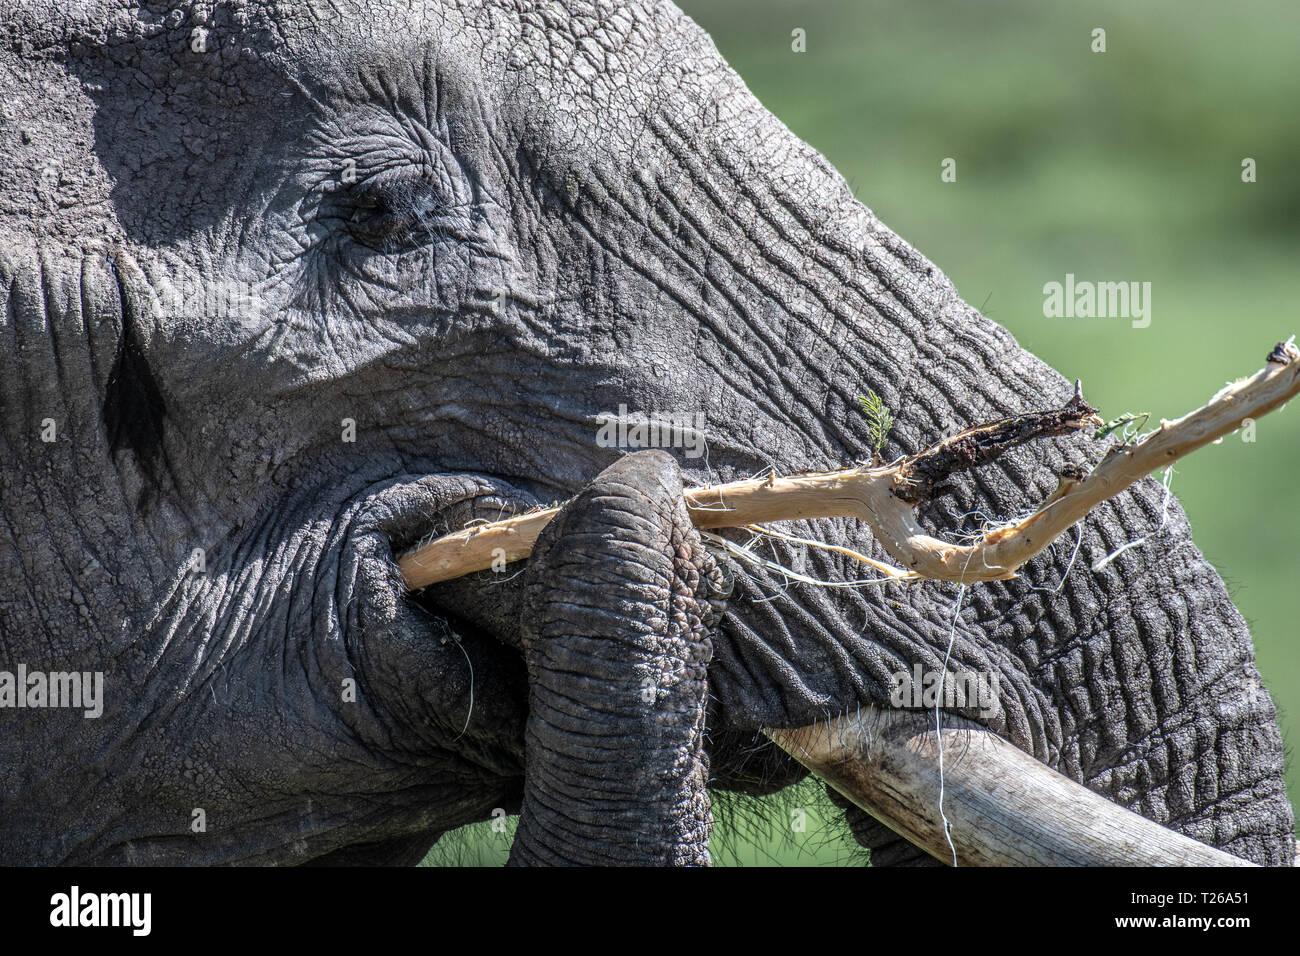 African bush elephant (Loxodonta africana), aka African savanna elephant - Maasai Mara National Reserve , Kenya Stock Photo